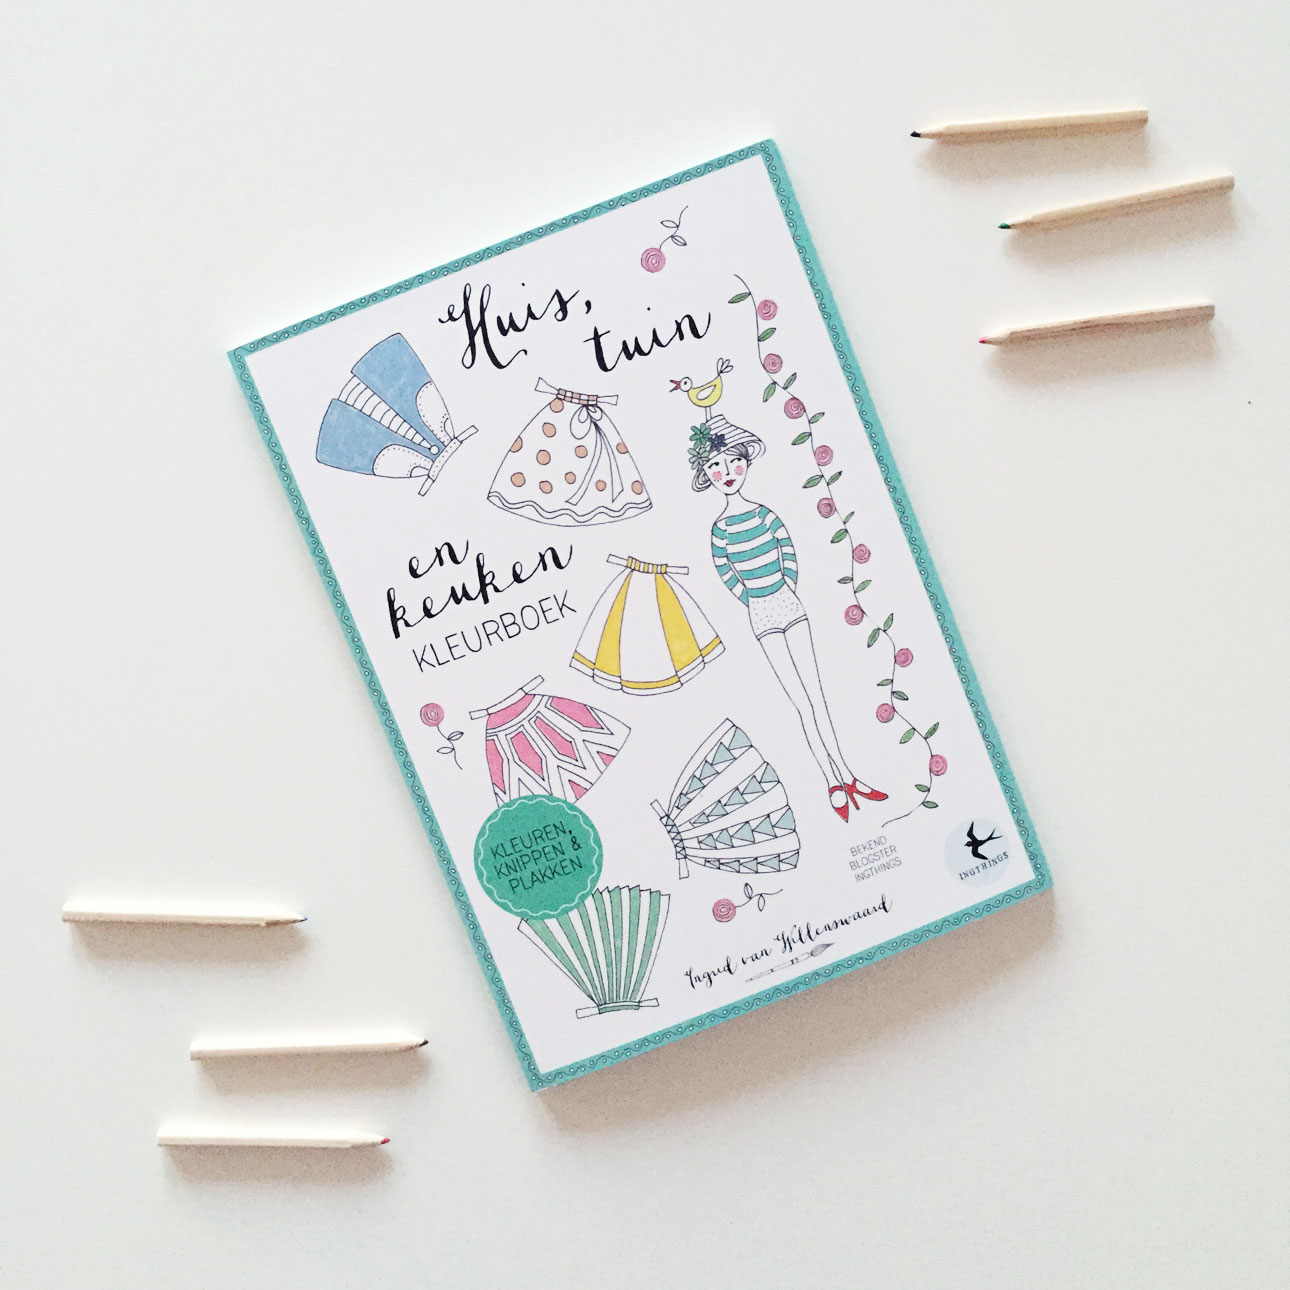 Huis, tuin en keukenkleurboek - Ingrid van Willenswaard - Kleurboek voor volwassenen